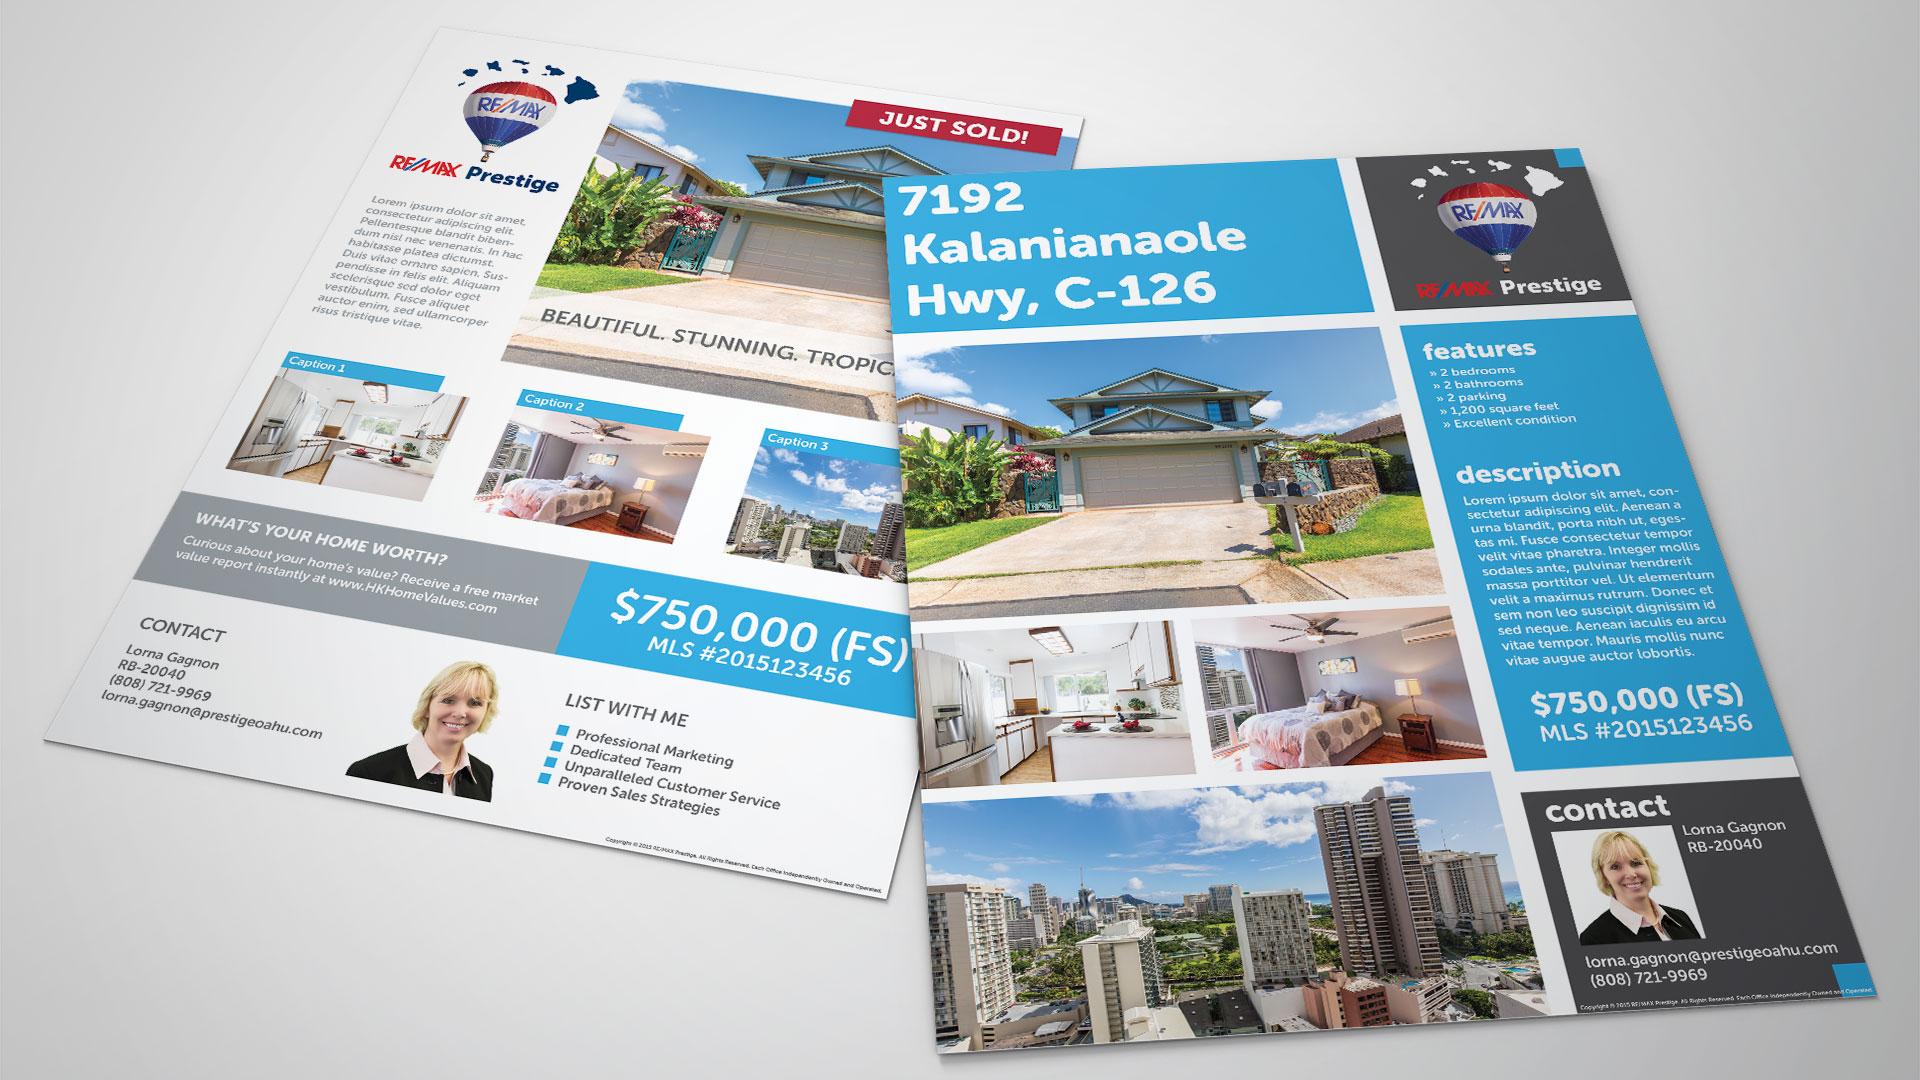 re max prestige property flyers re max prestige property flyers